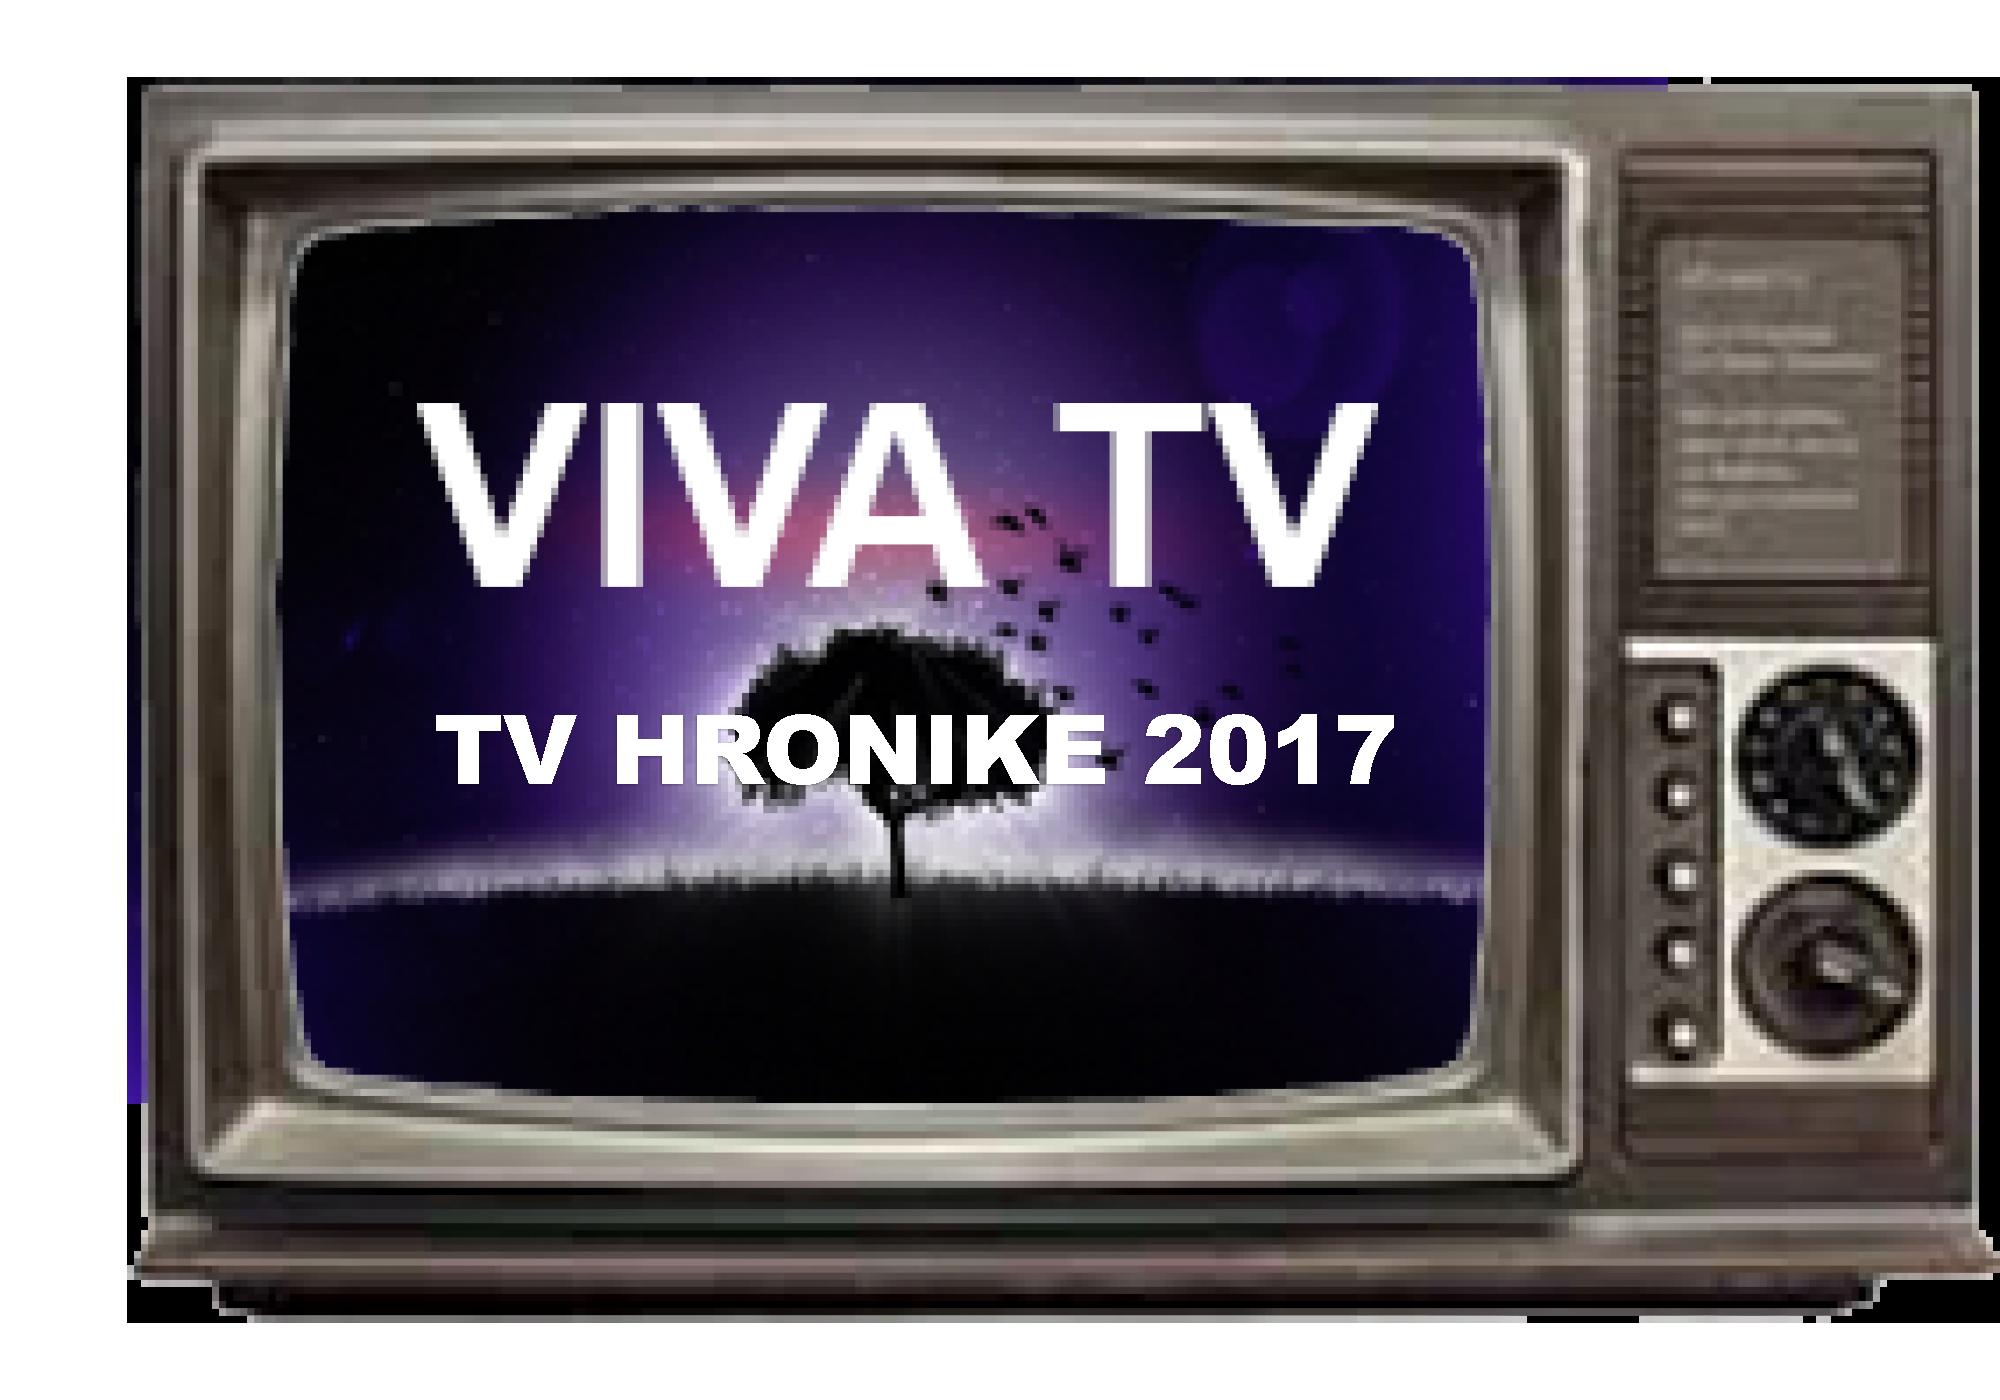 HRONIKE 2017